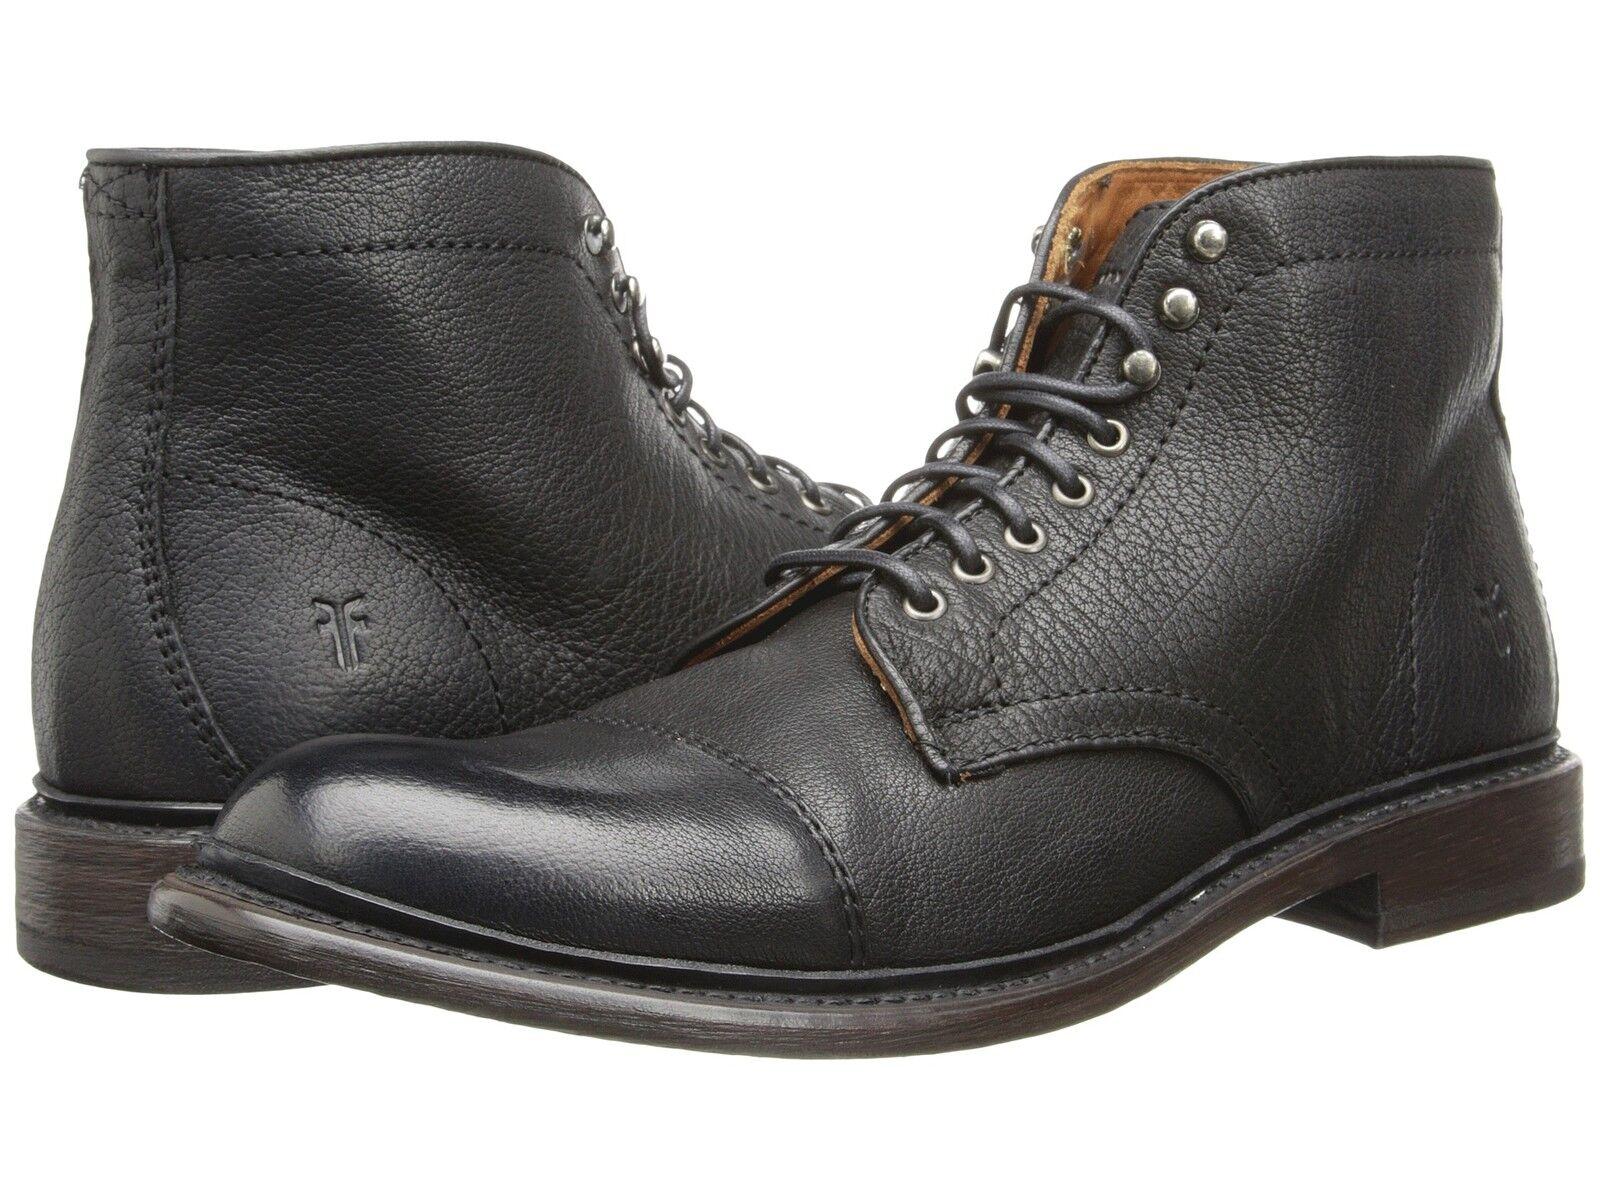 Men's Frye stivali Jack Cap Toe Lace Up avvio nero Leather 87893 BLK